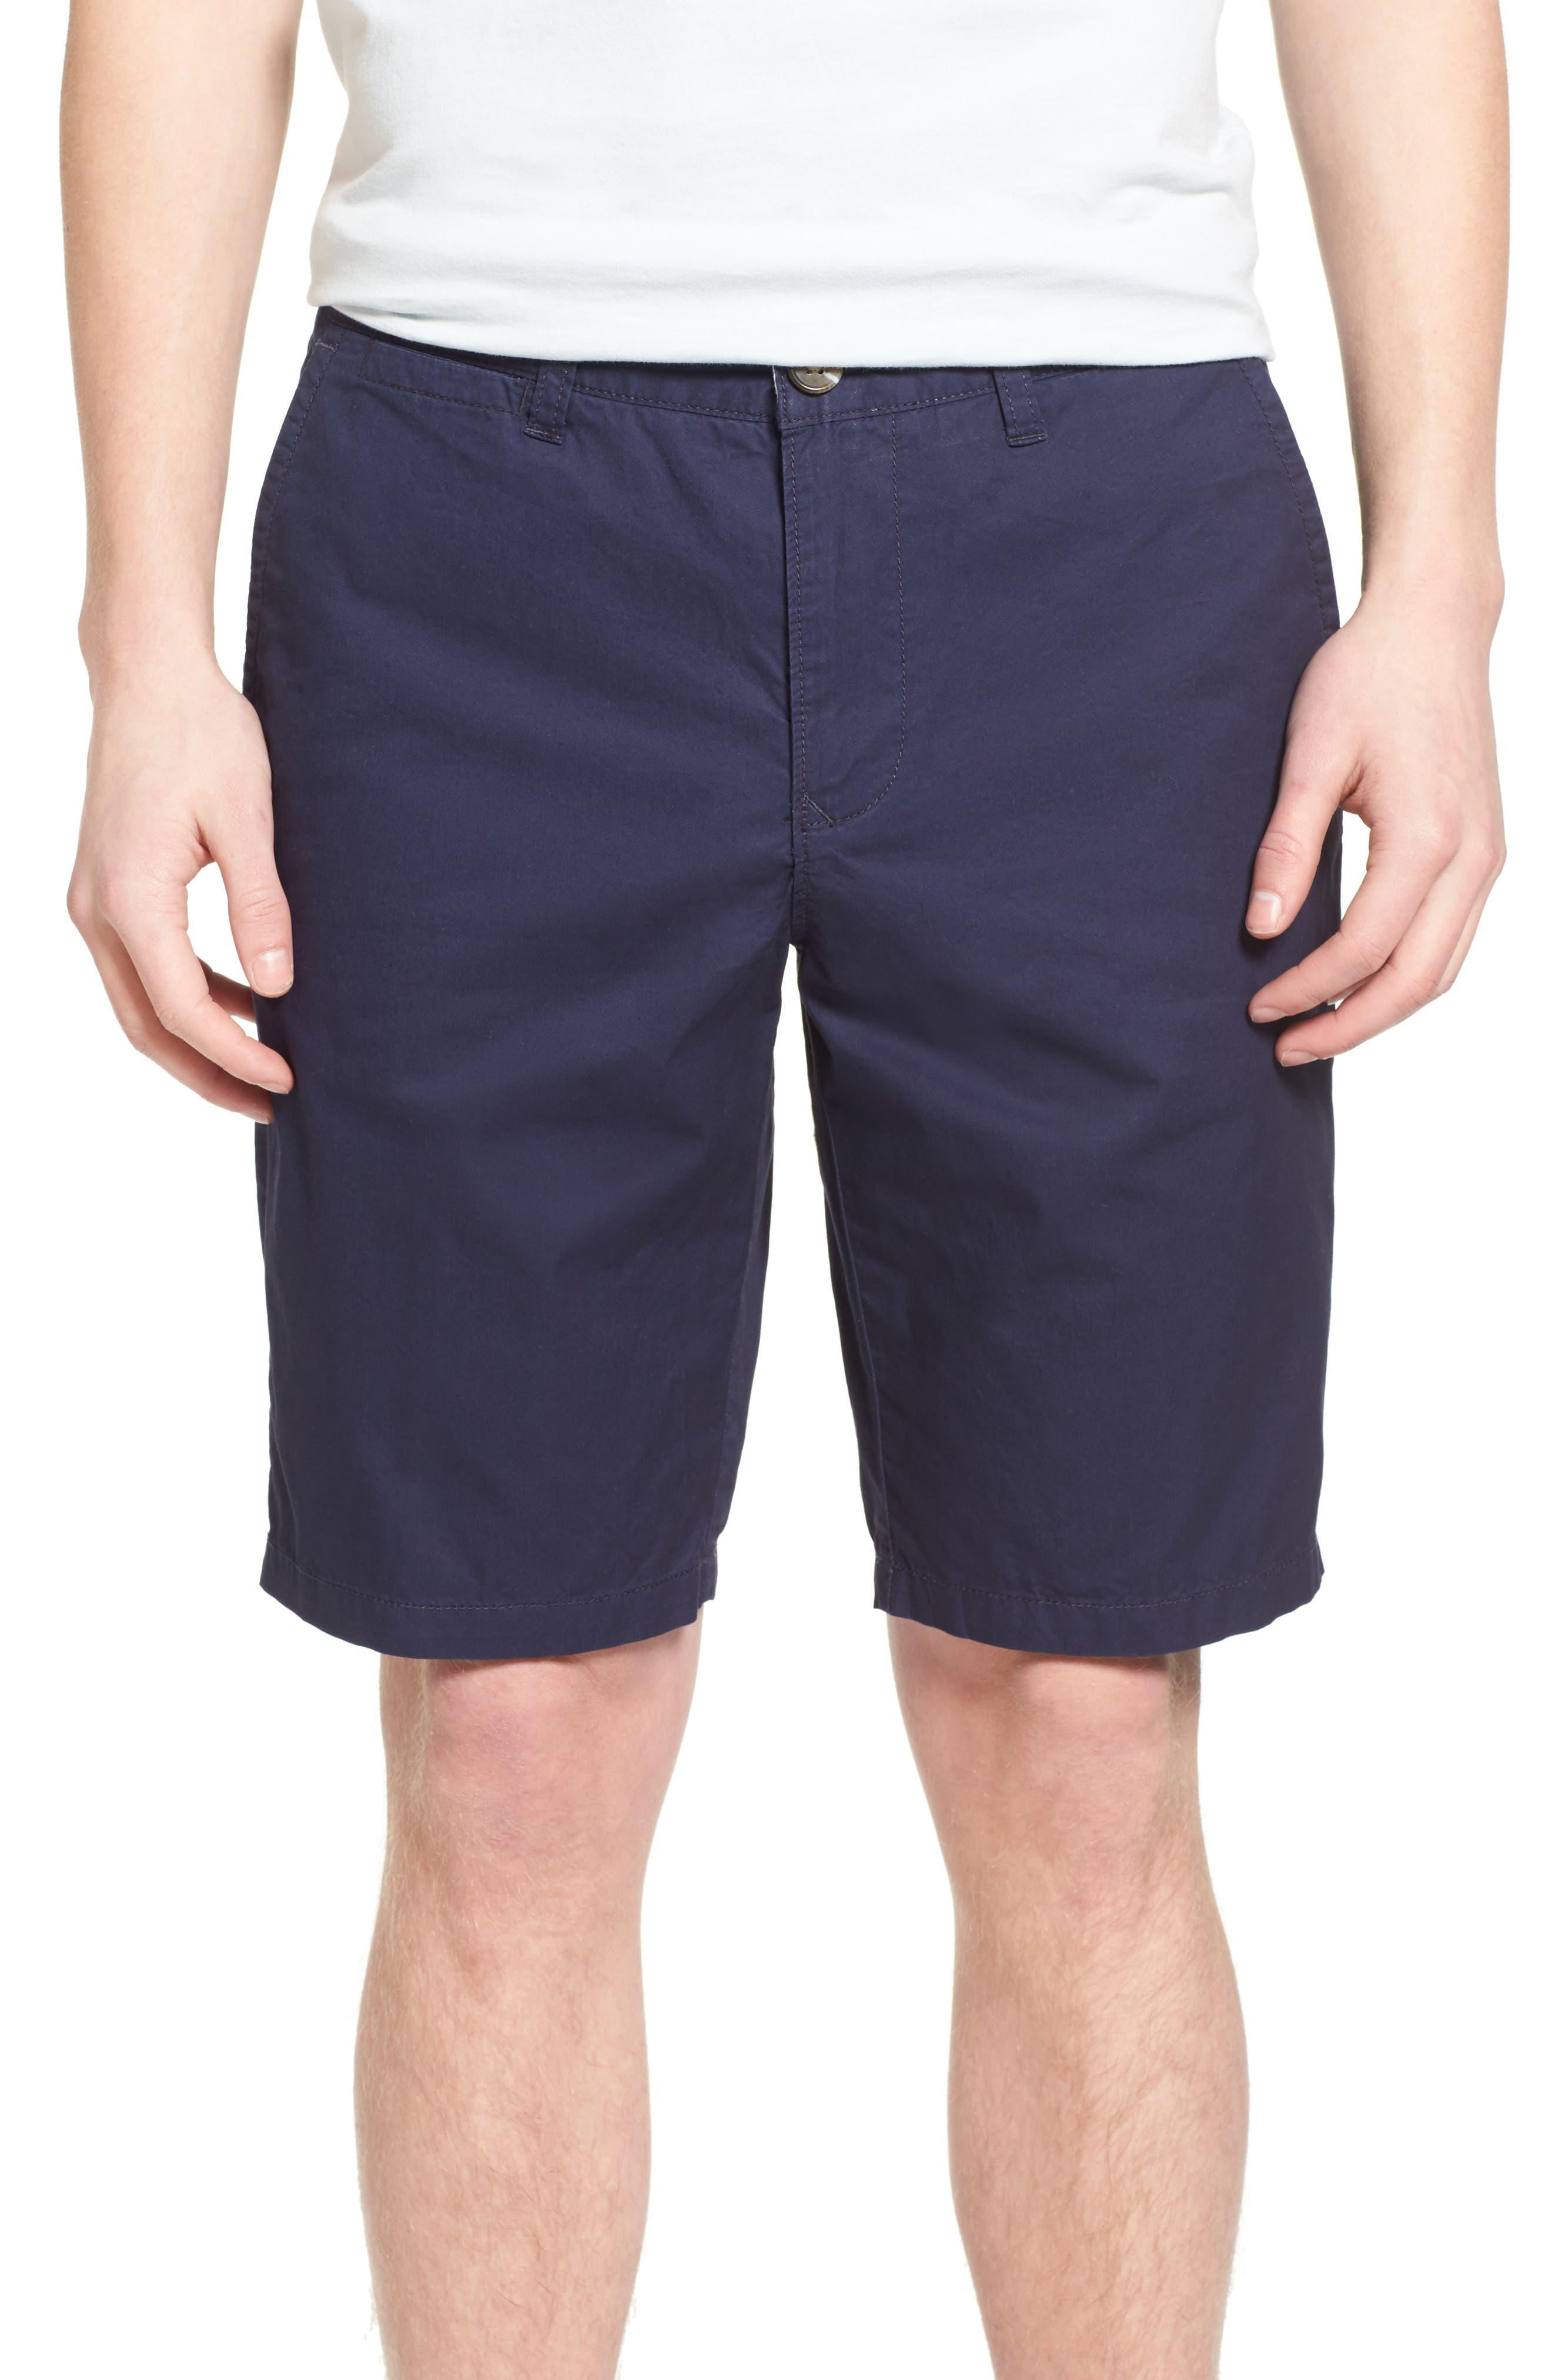 Alternate Image 1 Selected - 1901 Westport Shorts